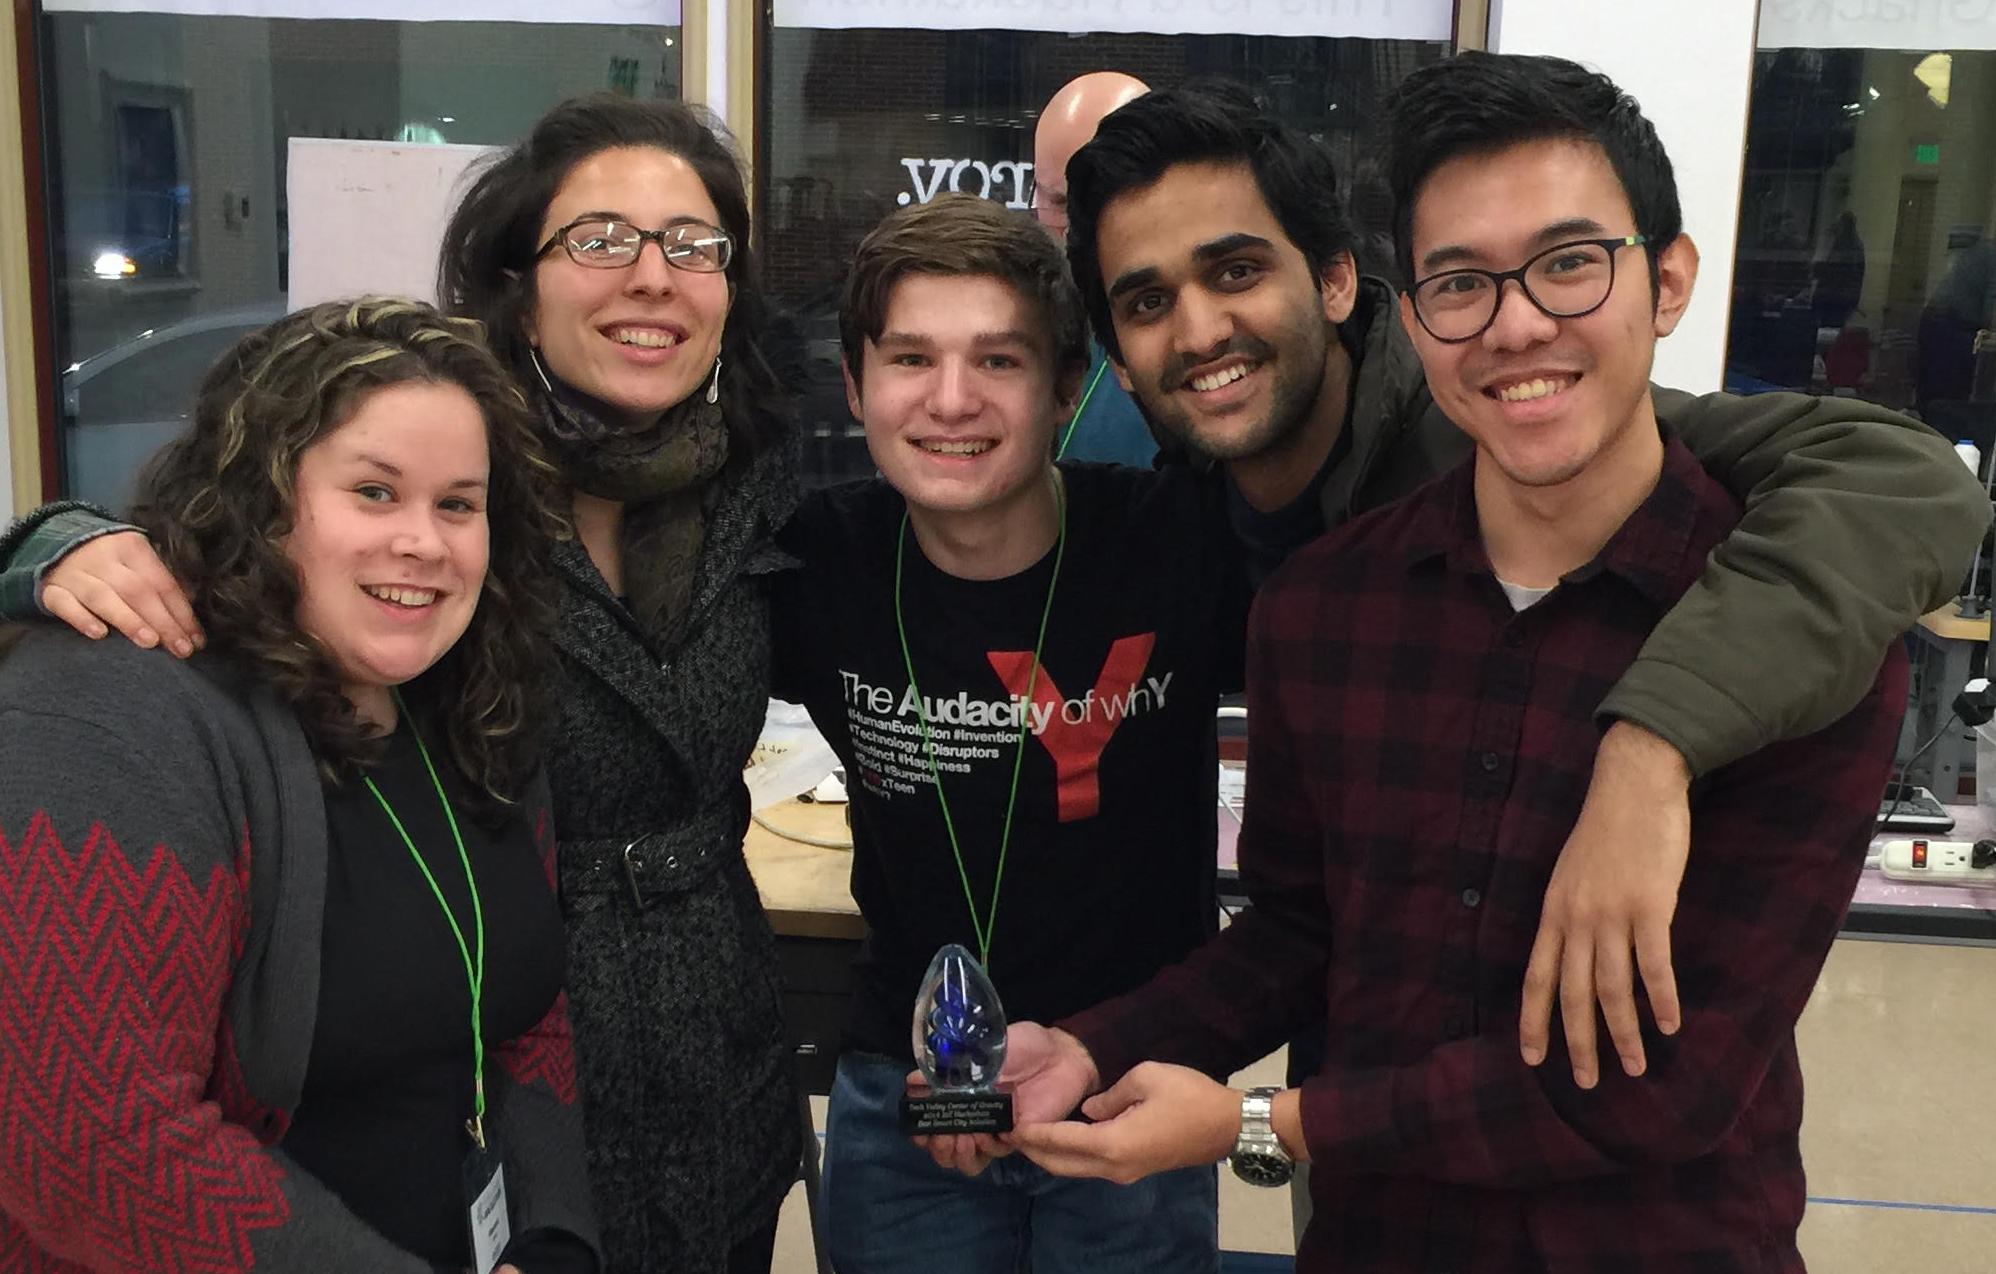 from left to right: Amanda Ervin (Union), Gabi Kosoy (Wadsworth Center), Finn Pike (Kingston HS), Arsal Habib (Union) and Htoo Wai Htet (Union)